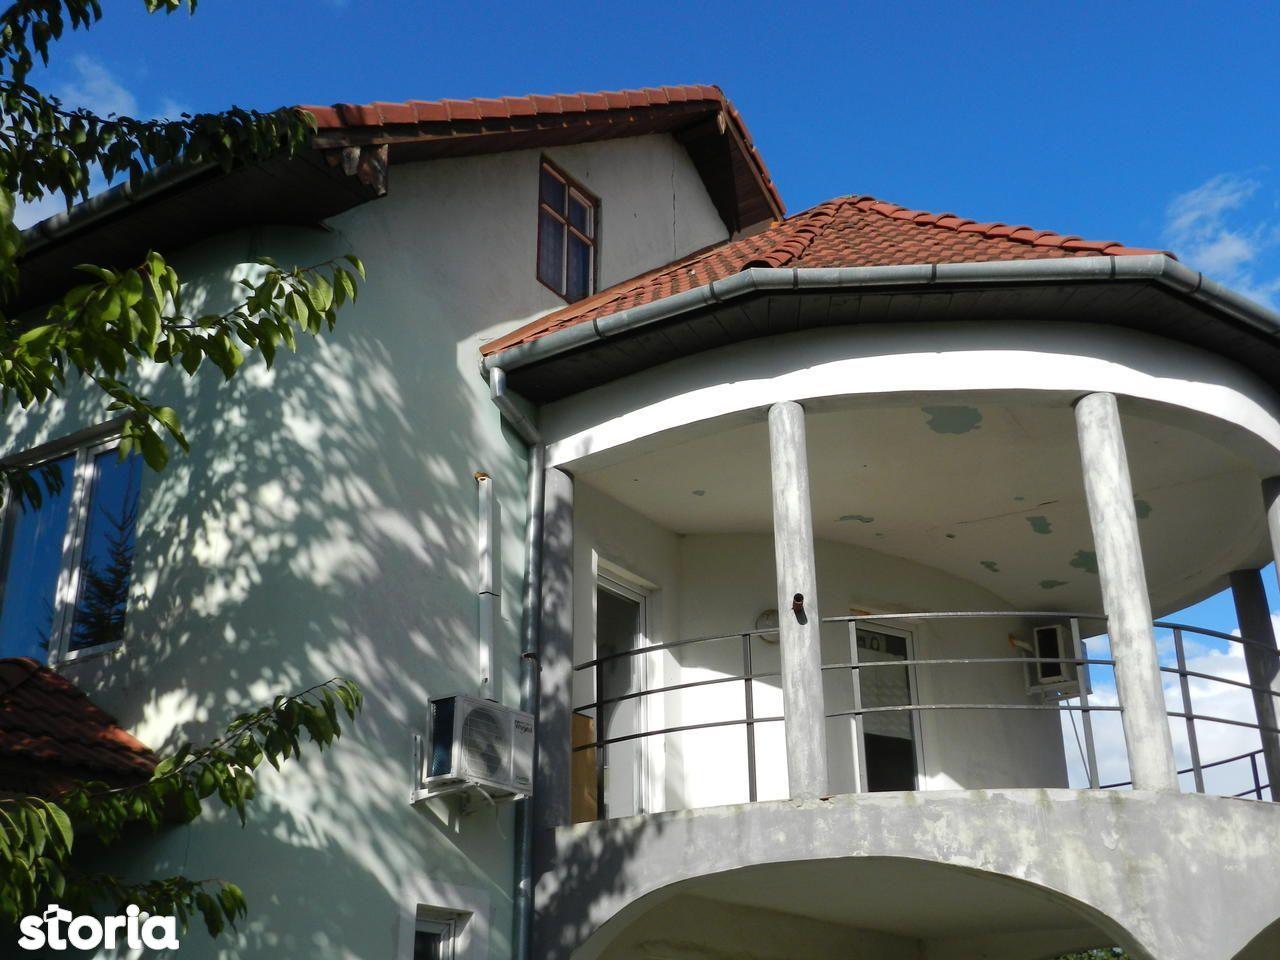 Casa de vanzare, Cluj (judet), Strada Ovidiu Iuliu Moldovan - Foto 1